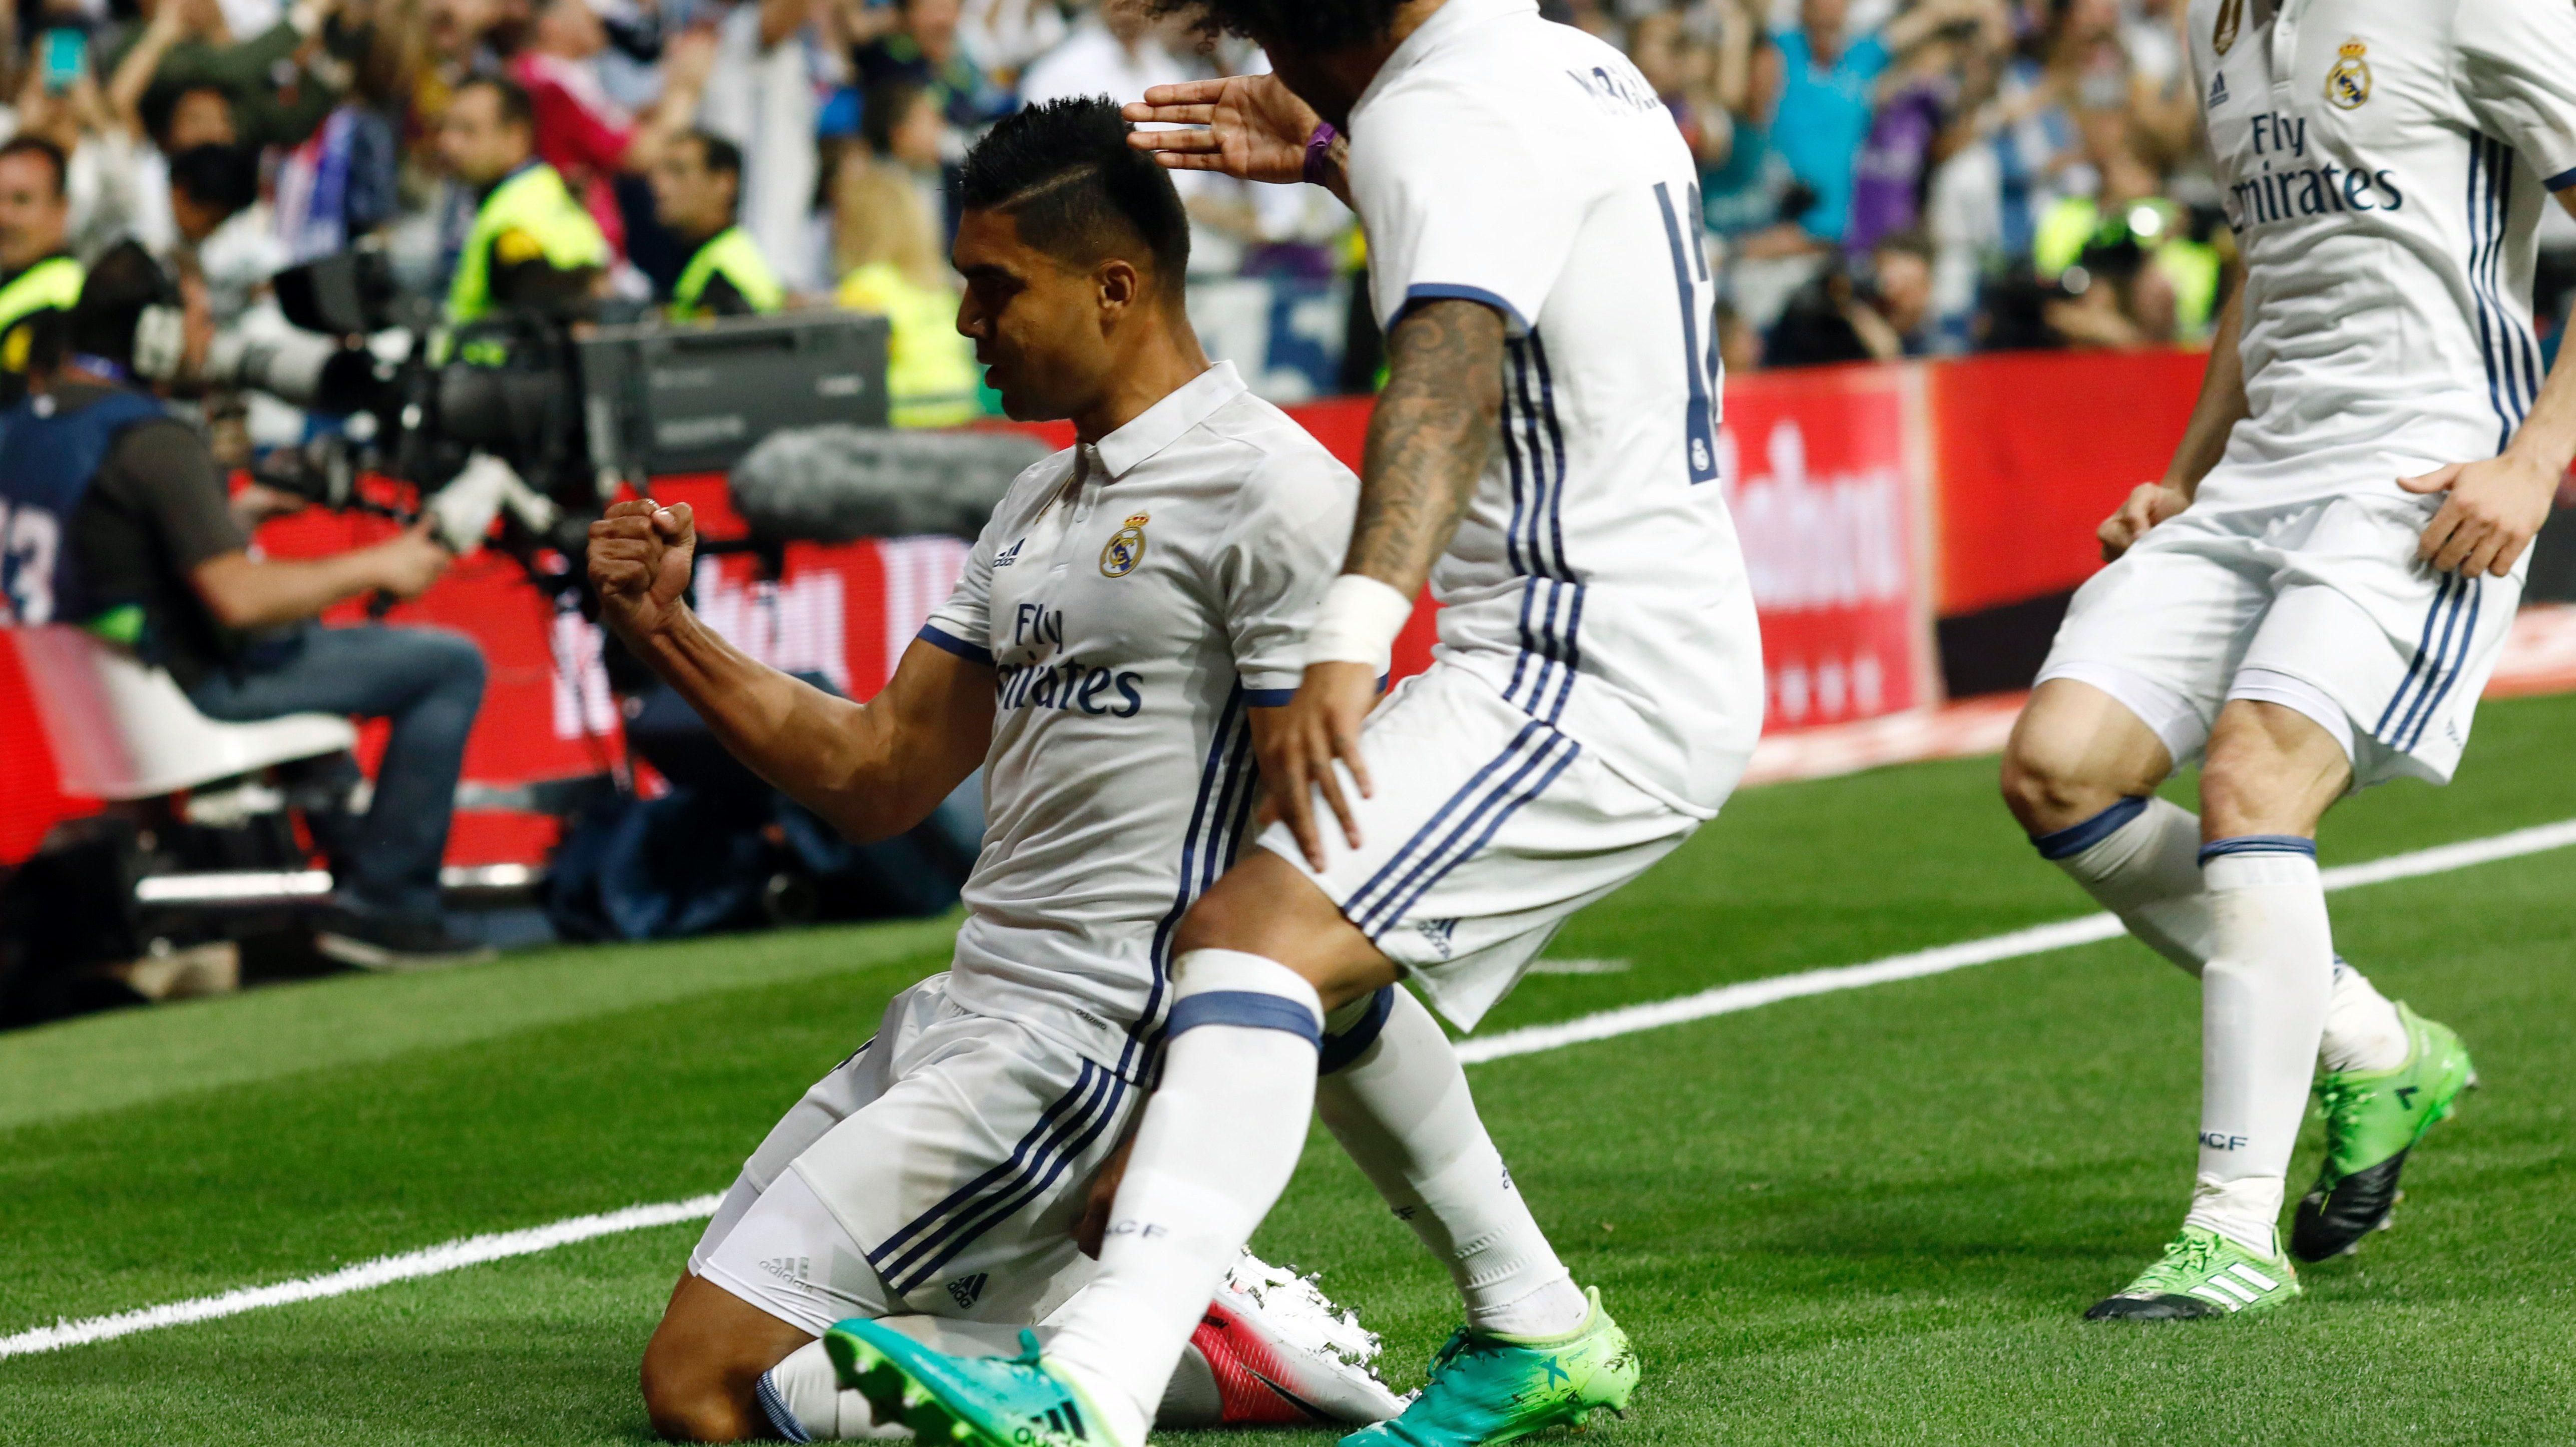 casemiro goal, el clasico goal video, real madrid el clasico goal video